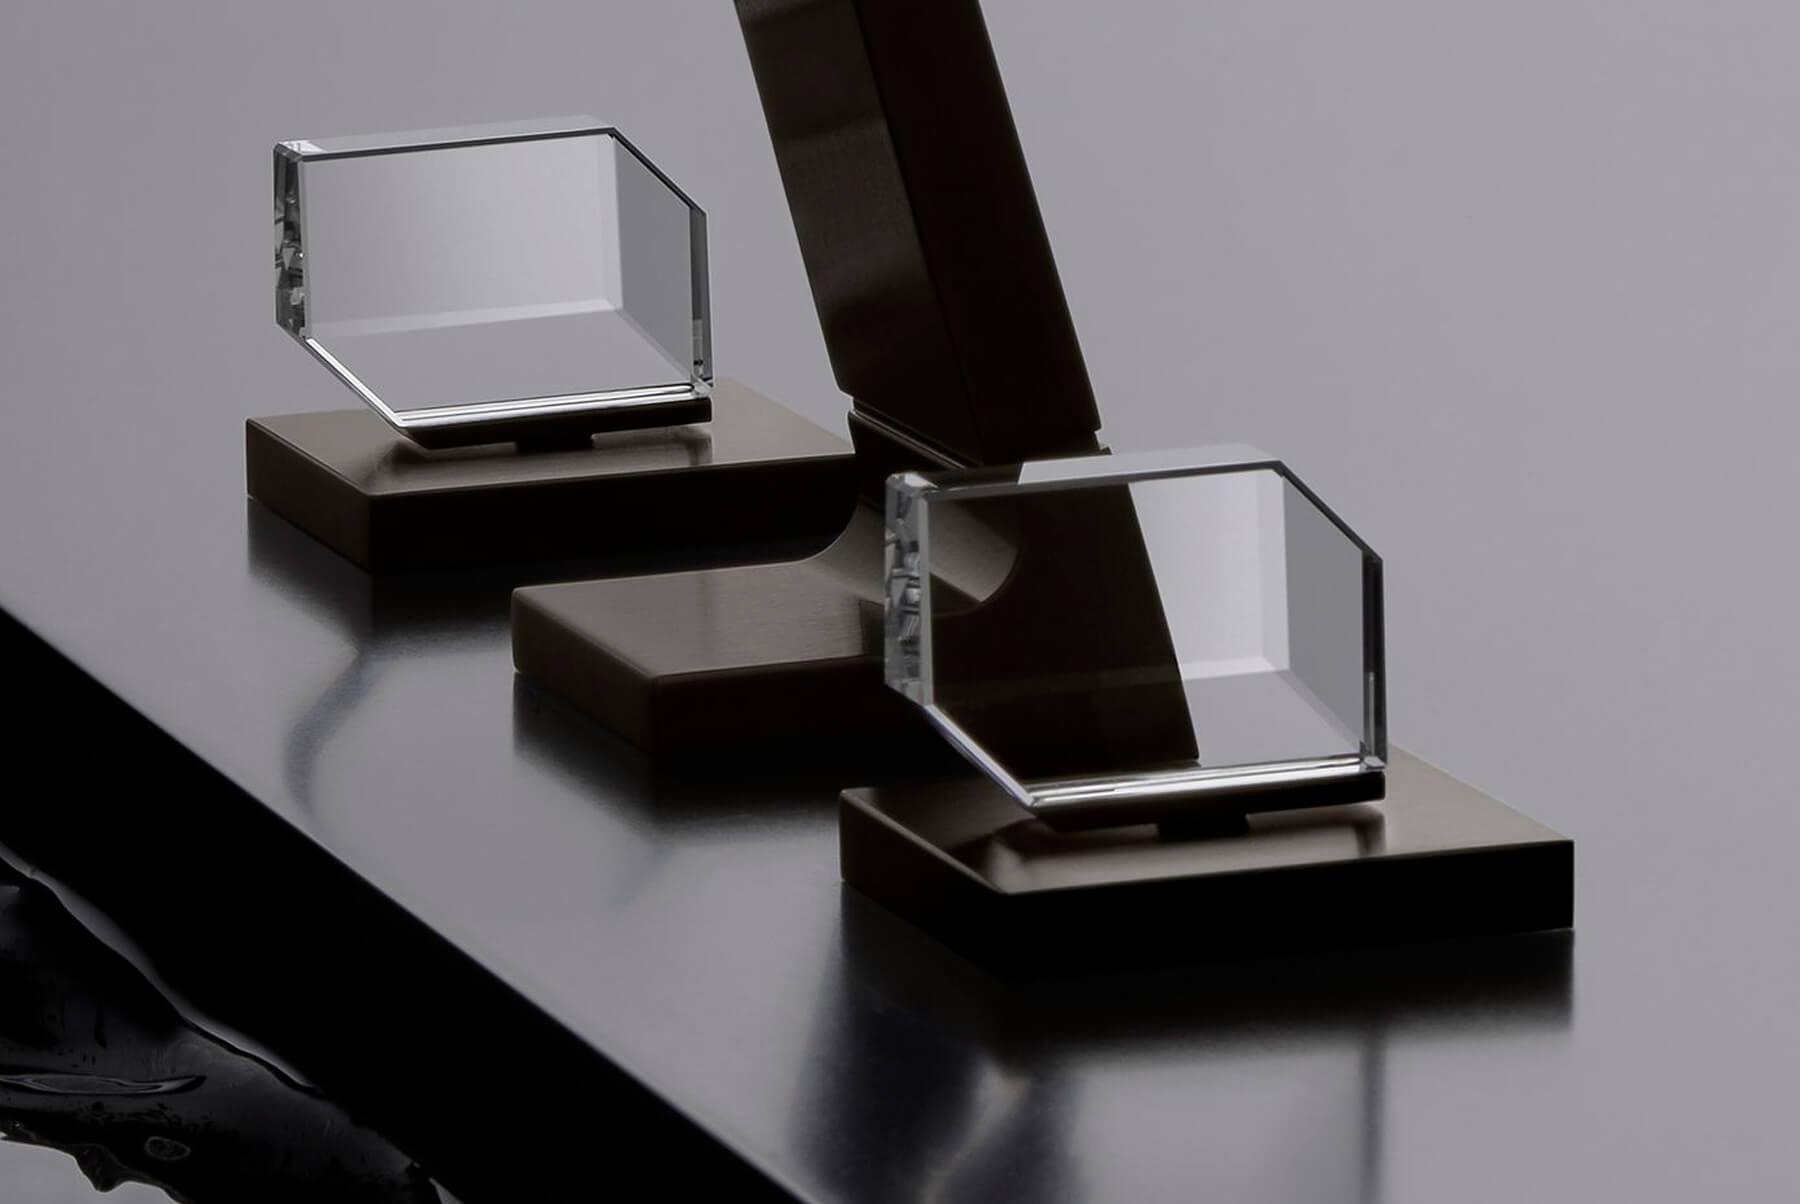 Brassware-Dornbracht-CL1-inset-6-1800x1204